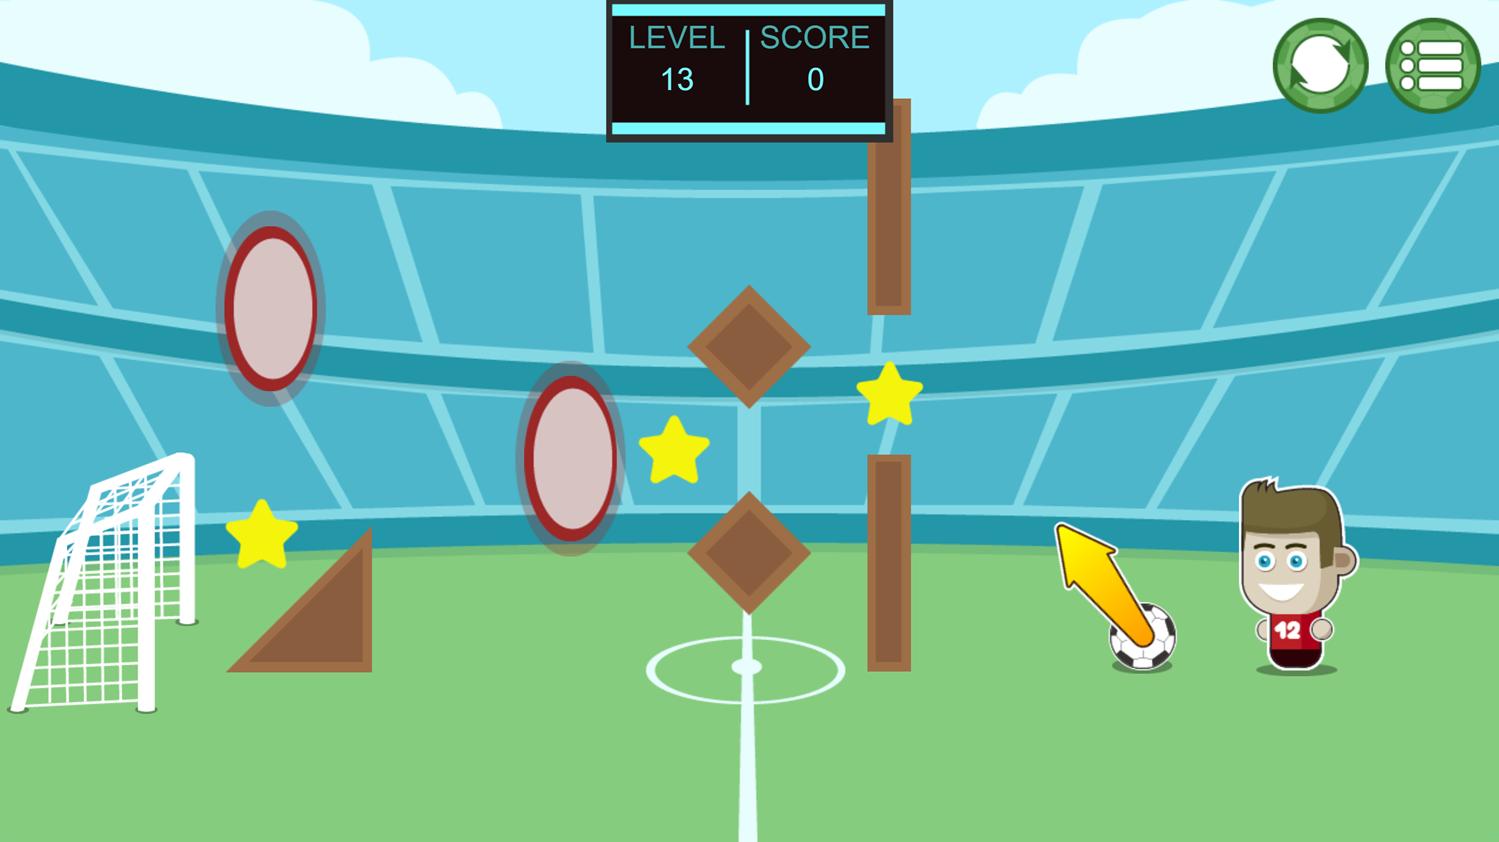 Footstar Game Screenshot.